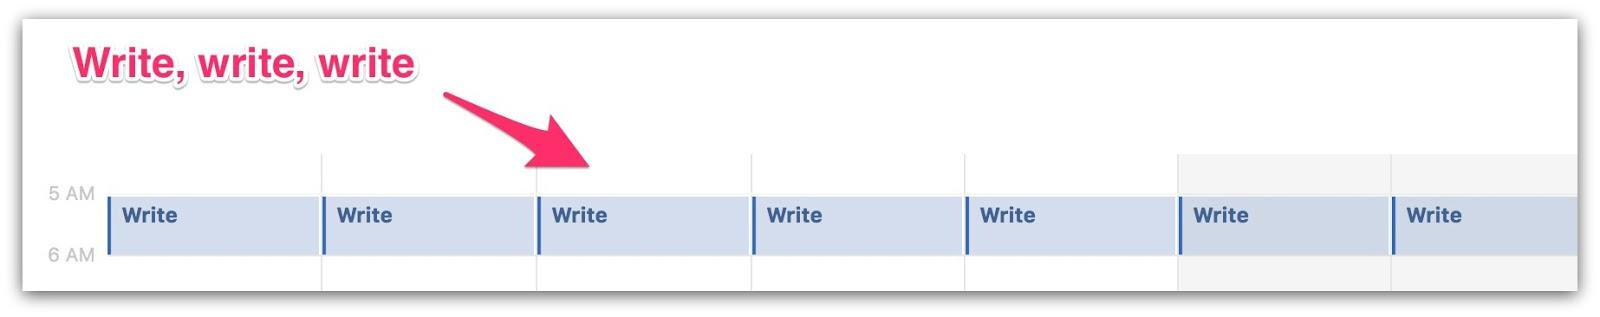 content creation calendar